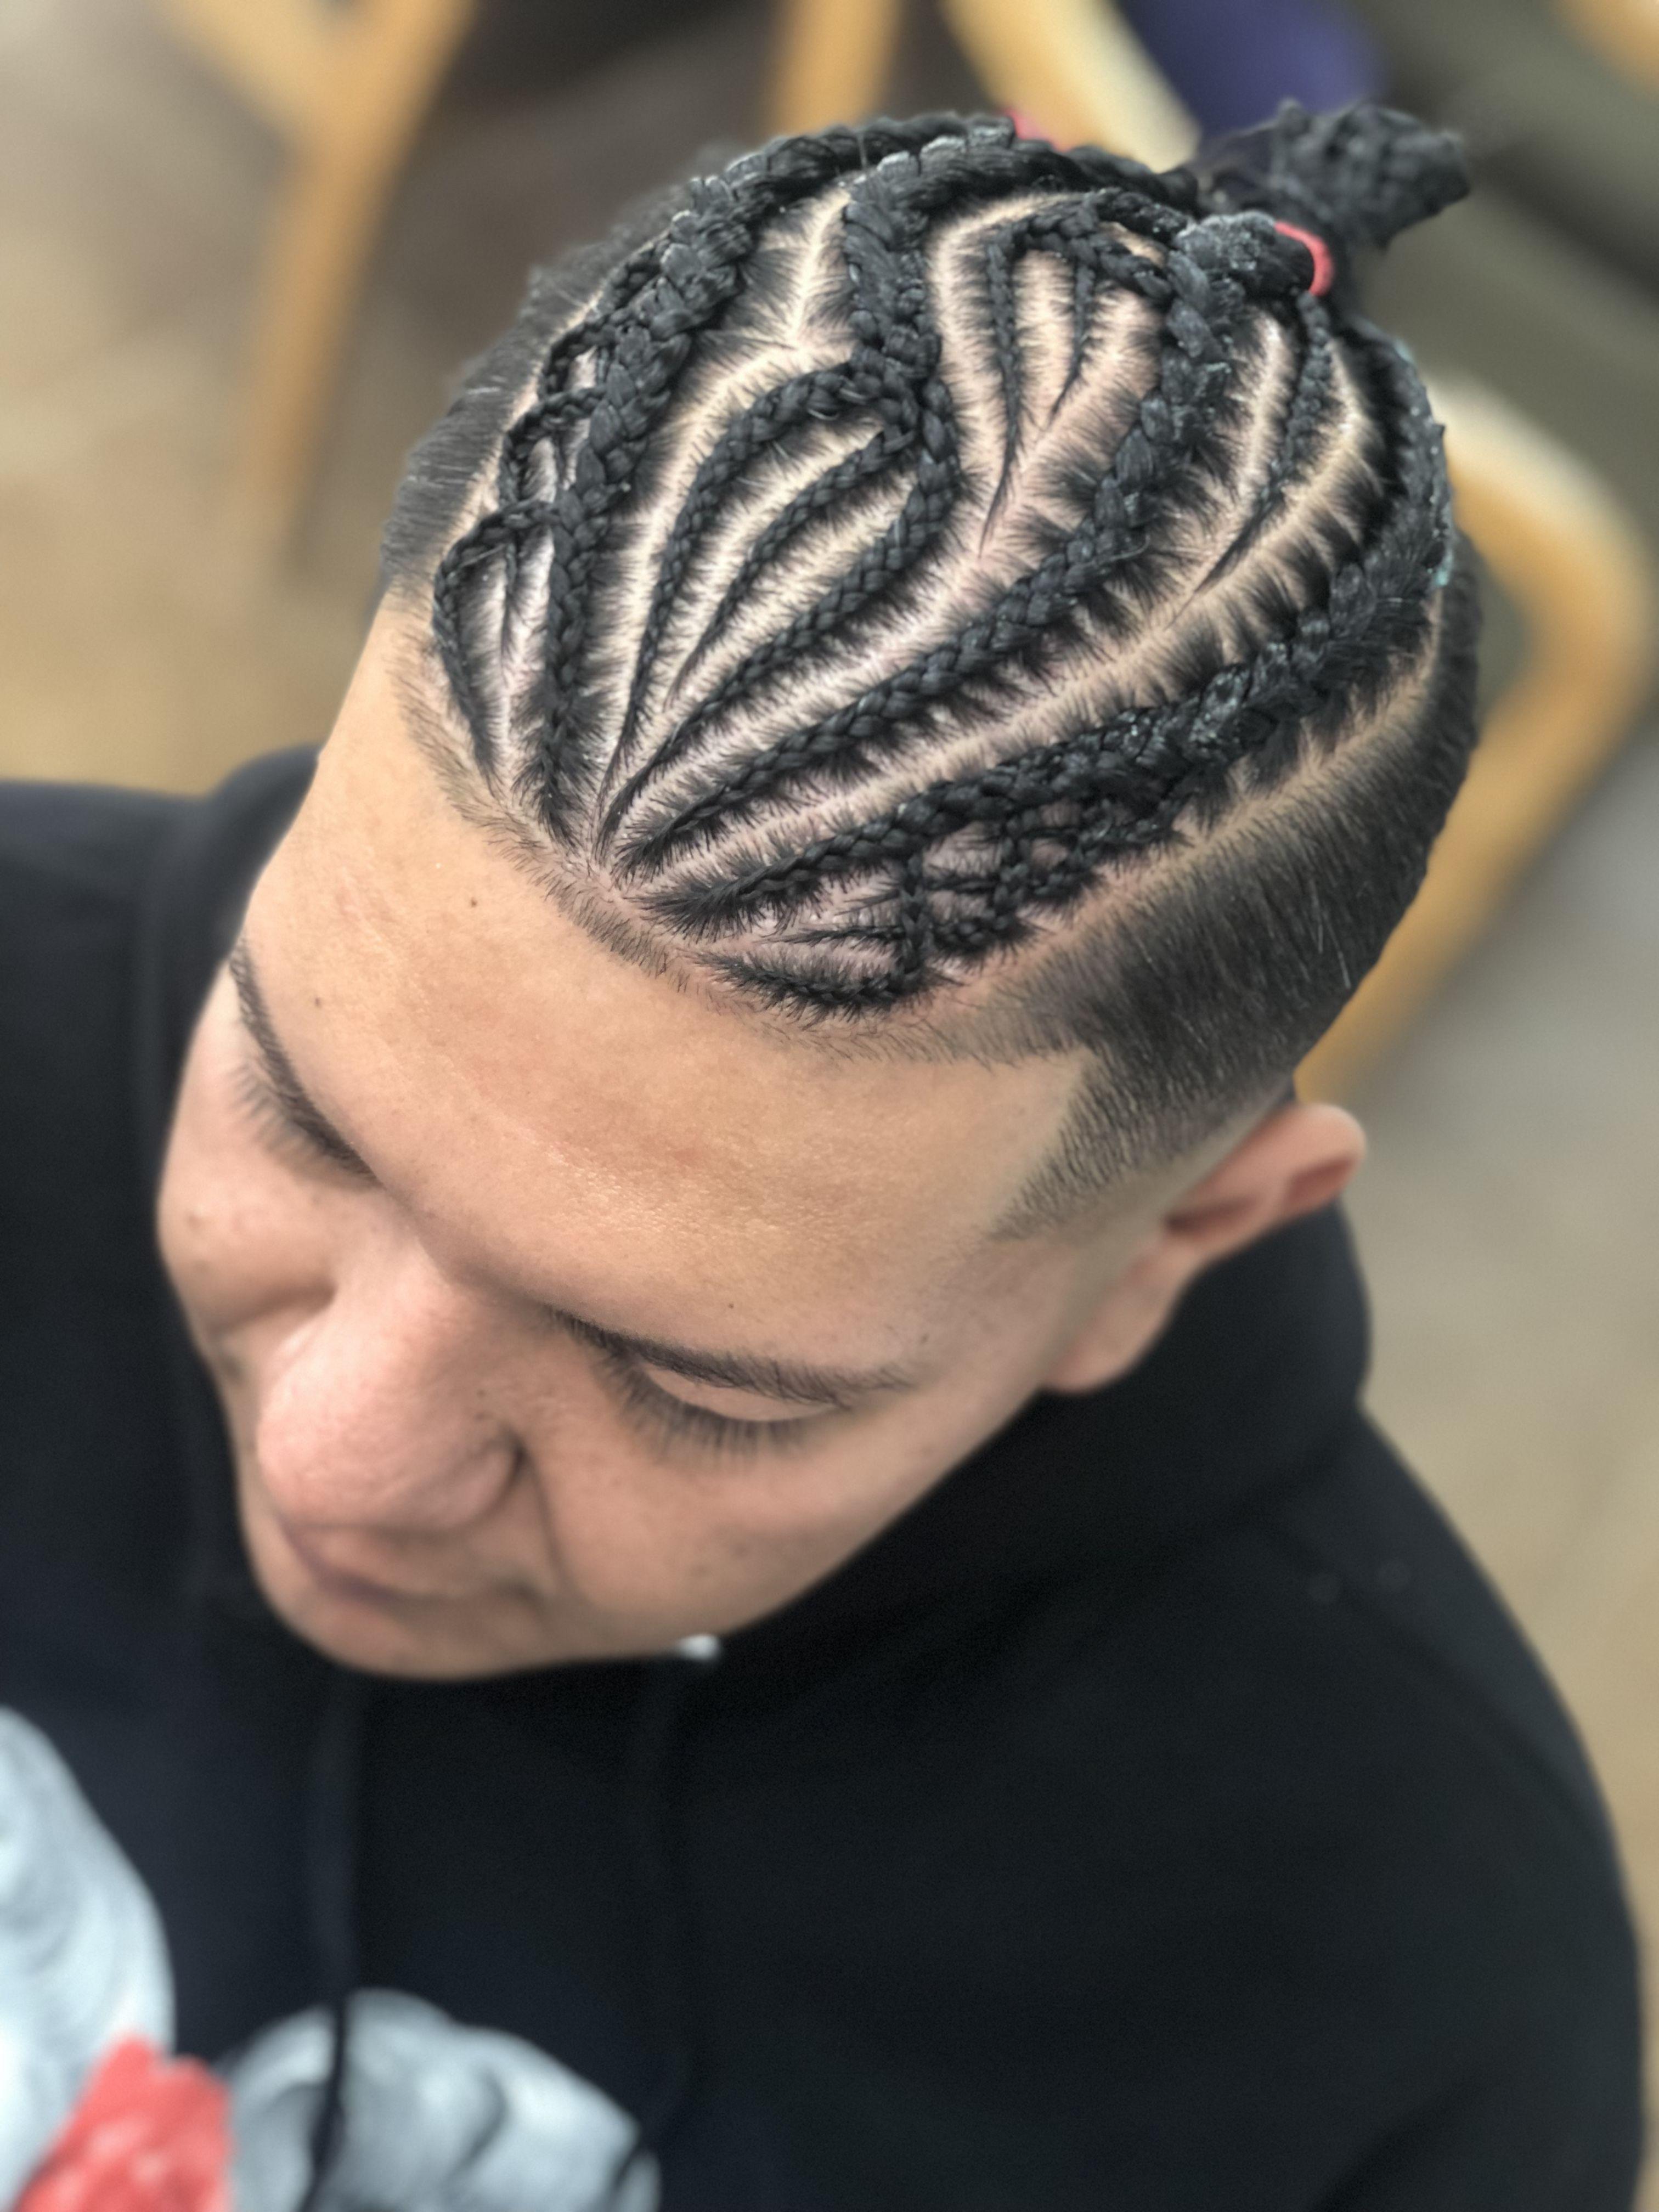 Pin By Jackie Gonzalez On Braids For Guys In 2019 Braids